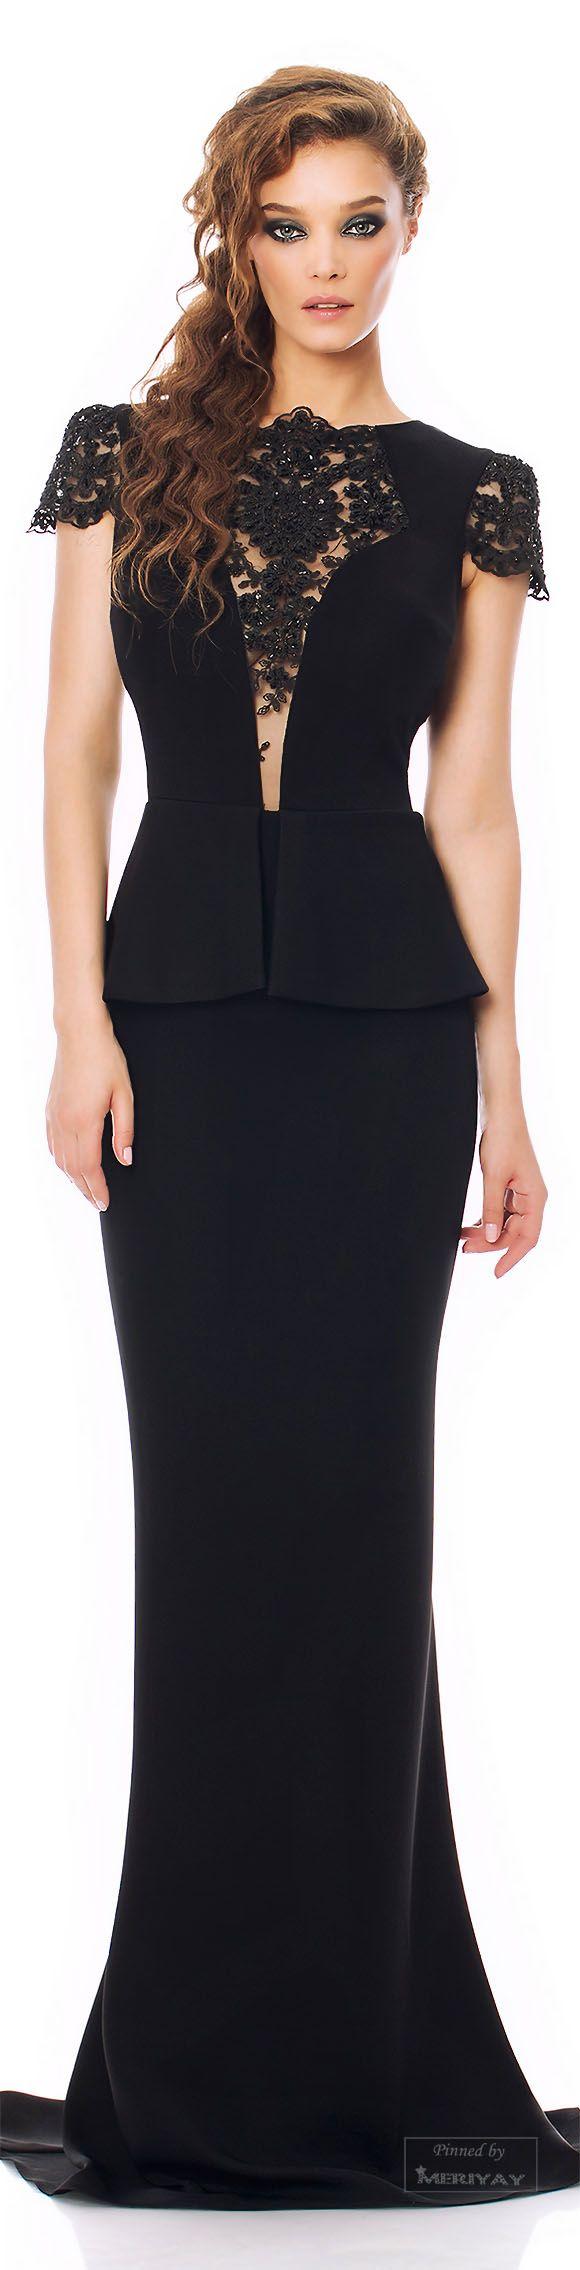 Blue black tie dresses